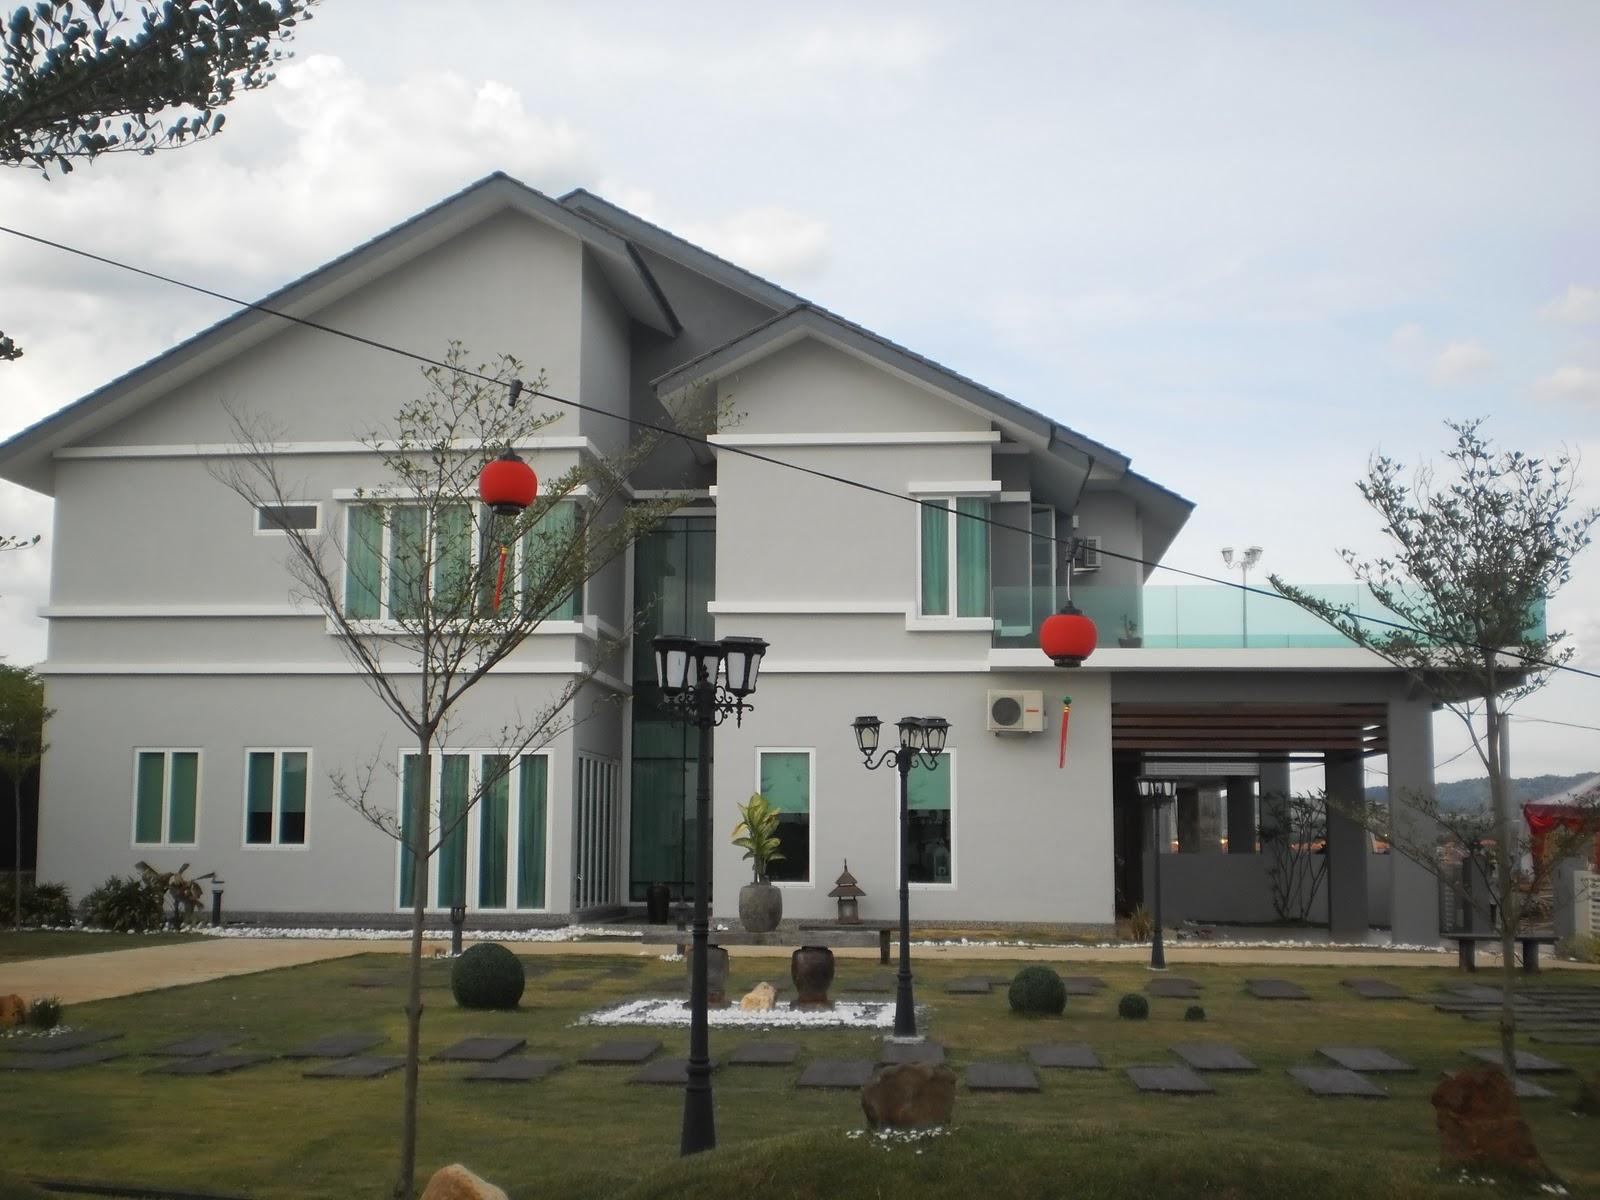 Download image Contoh Hiasan Dalaman Rumah Pelauts Com PC, Android ...